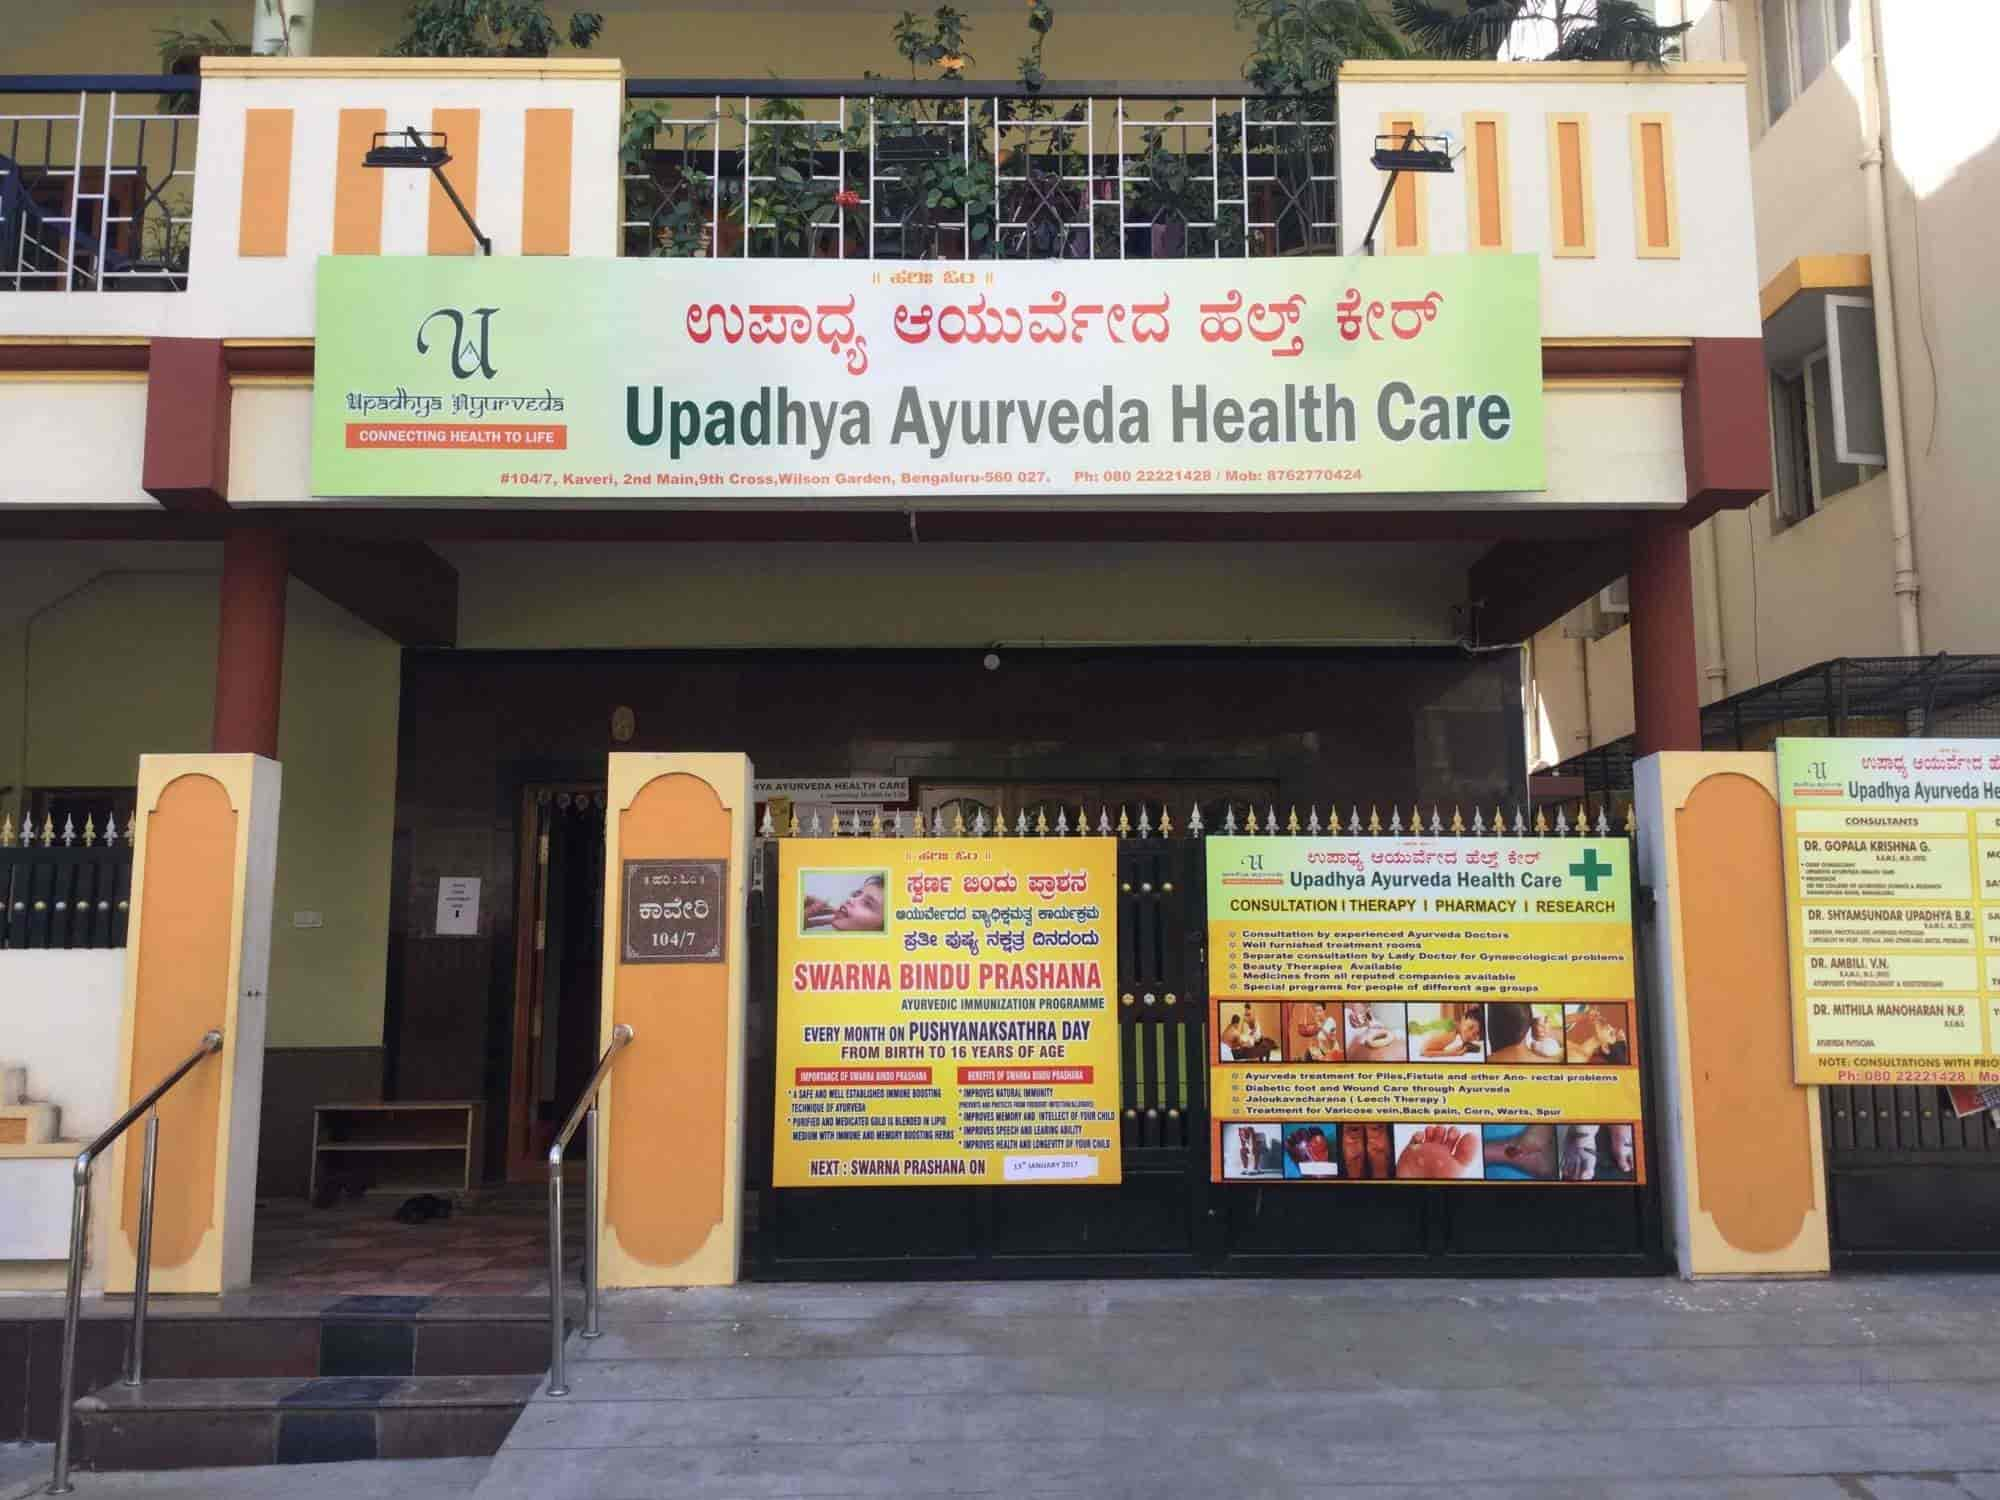 Upadhya Ayurveda Health Care - Ayurvedic Doctors - Book